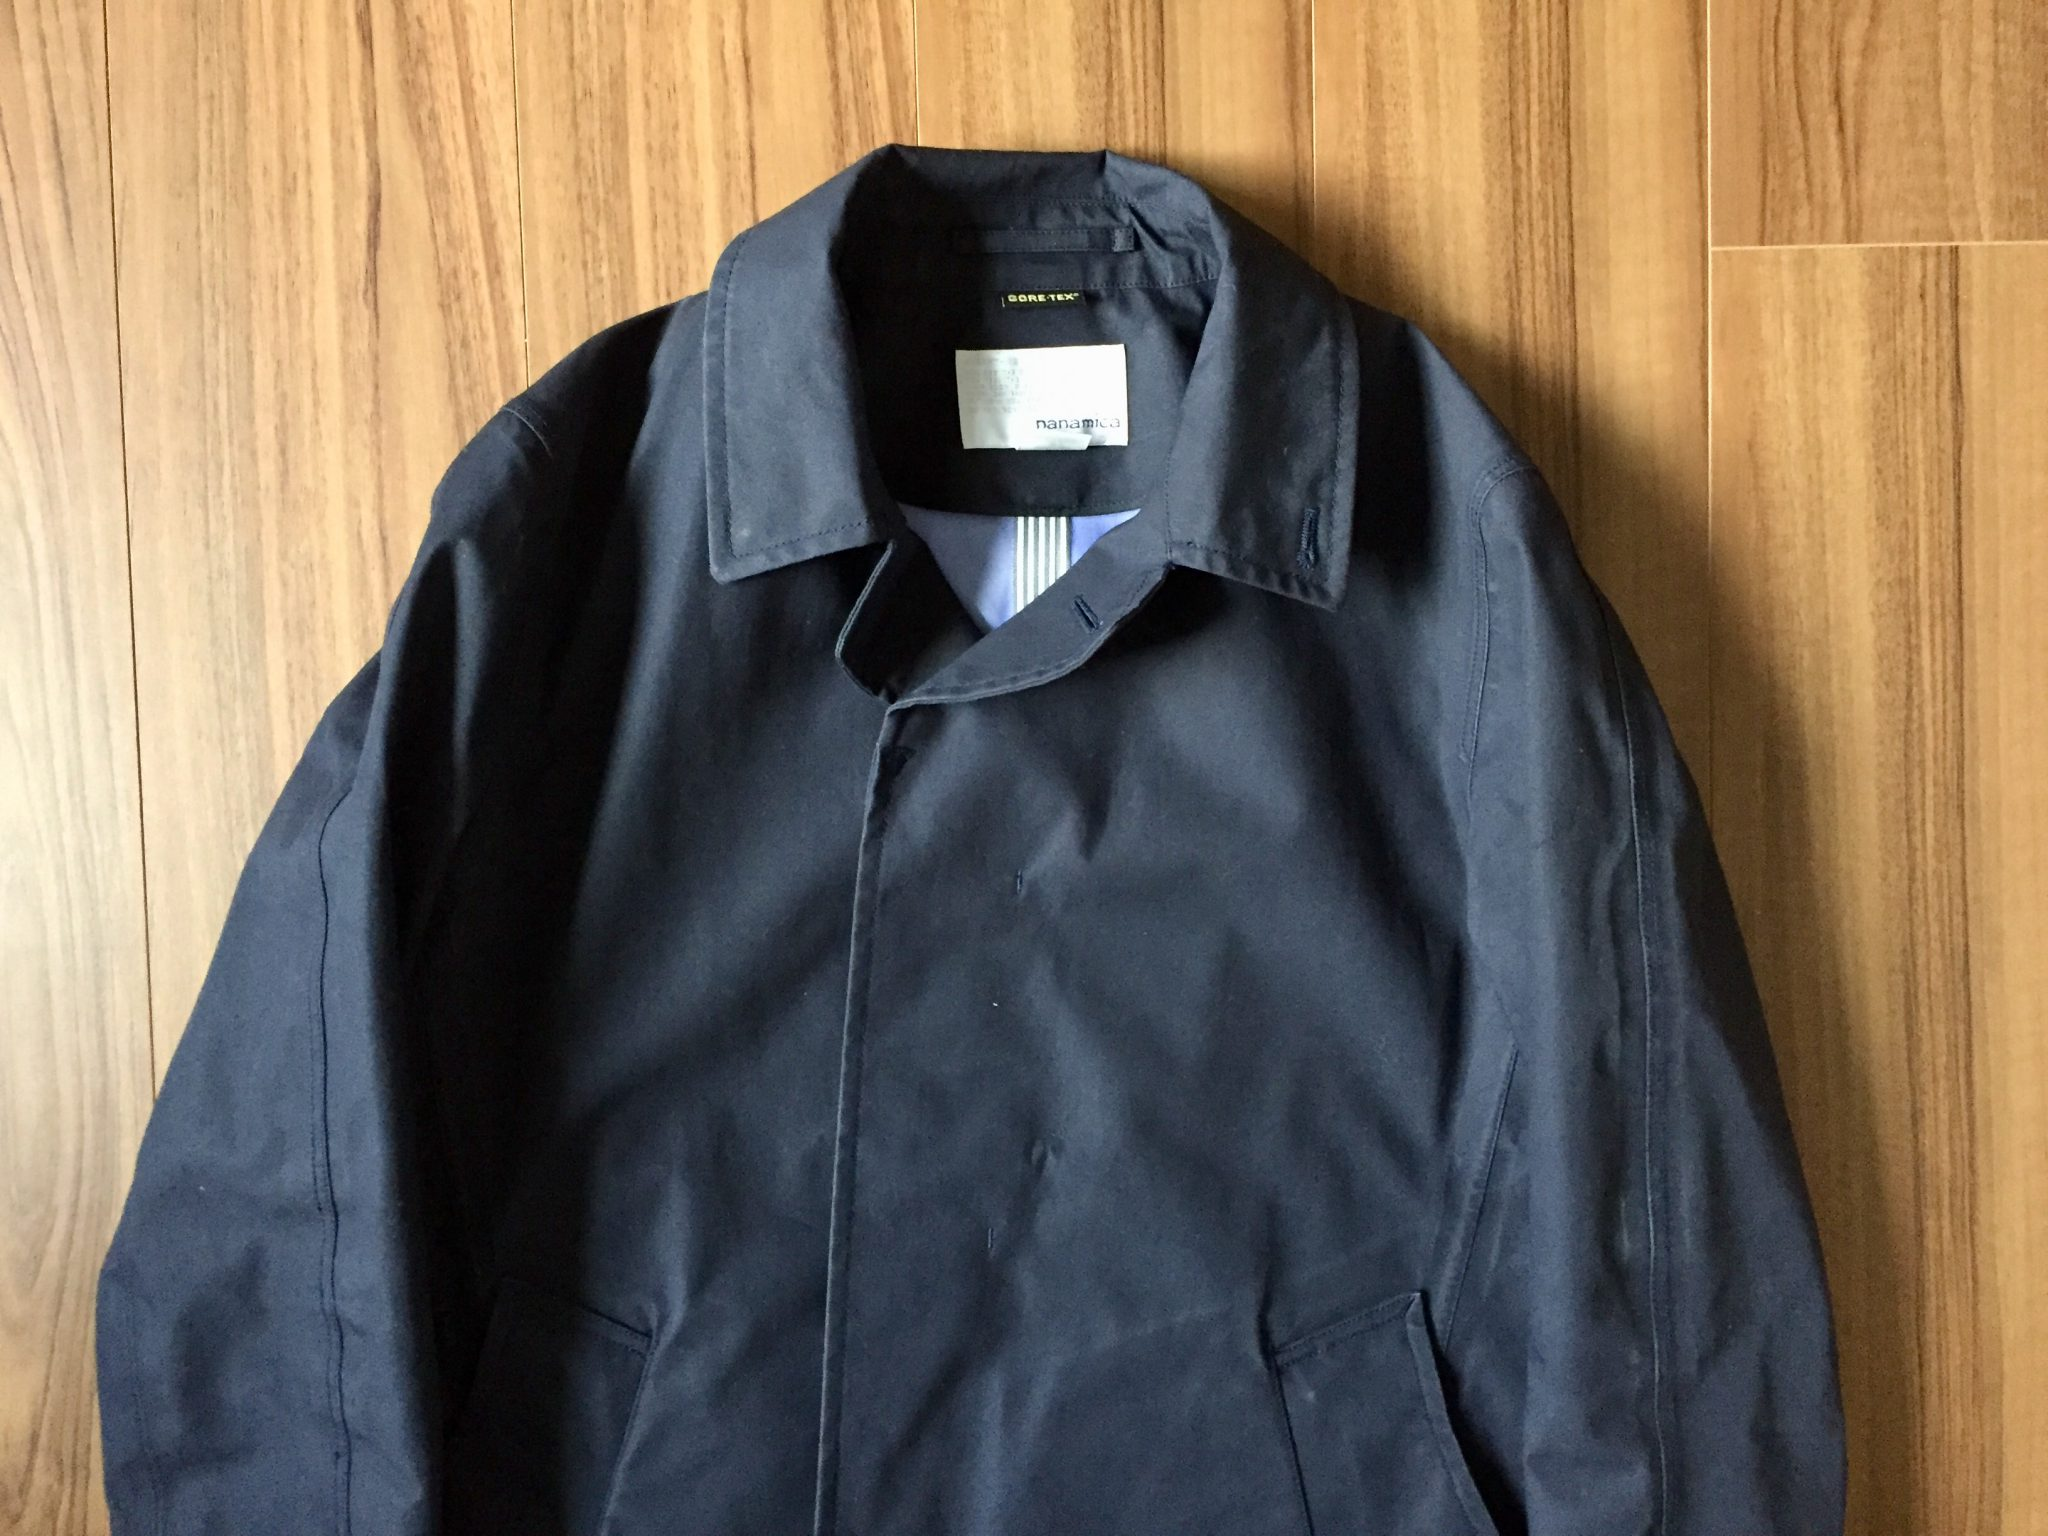 nanamica GORE-TEX Soutien Collar Coat(ナナミカ ゴアテック ステンカラーコート)|10年着れるコットンゴアに魅了されて、2着目としてステンカラーコートを購入